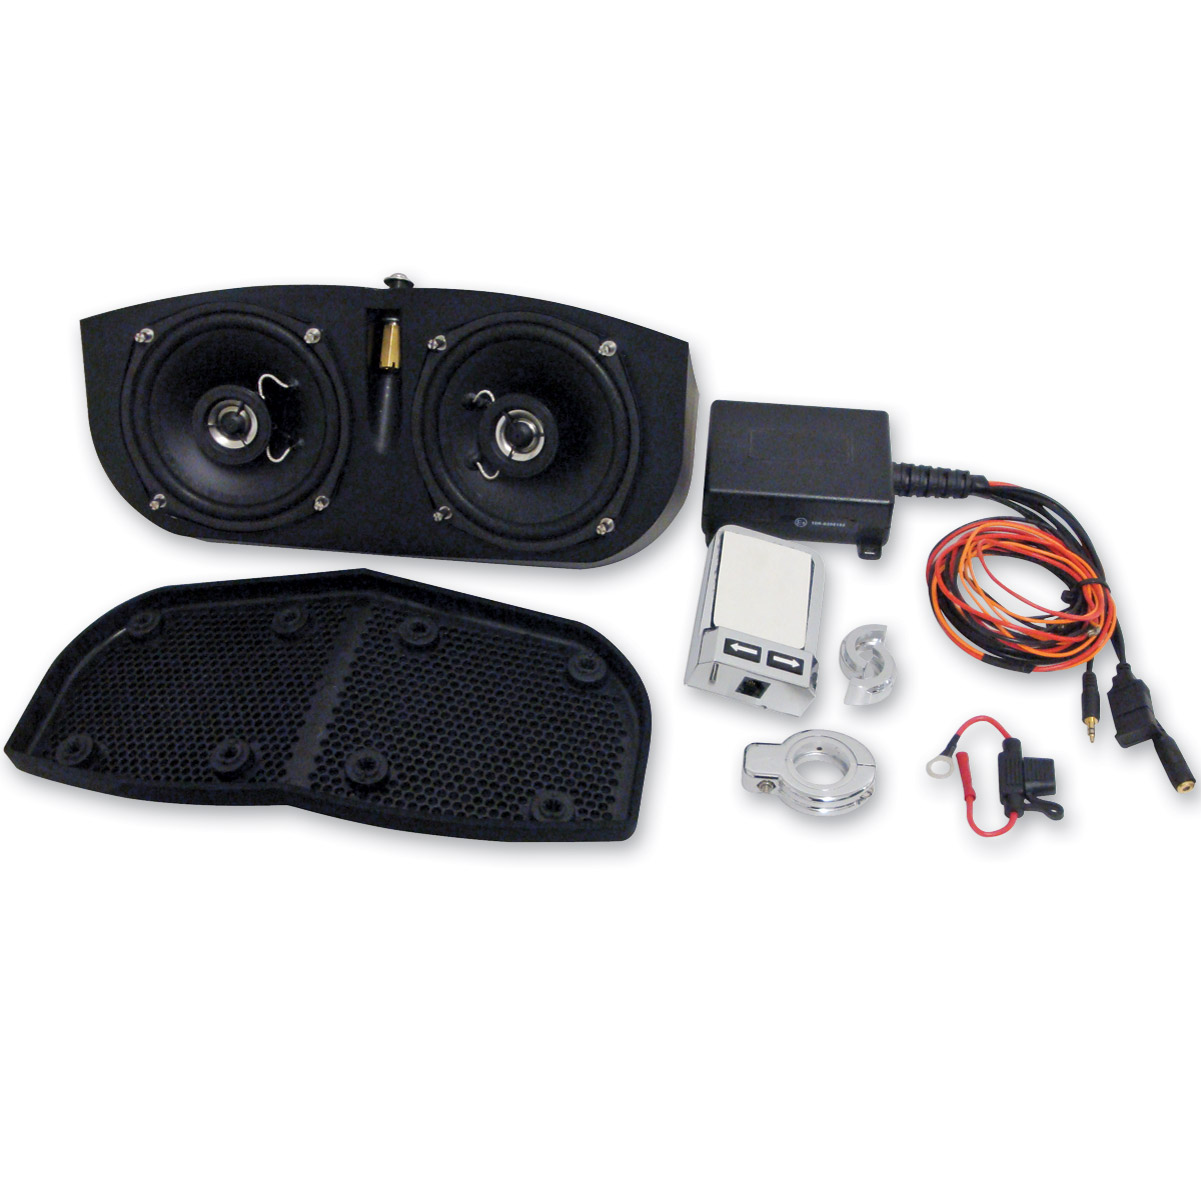 Harley-Davidson Sportster Audio & Electronics | J&P Cycles